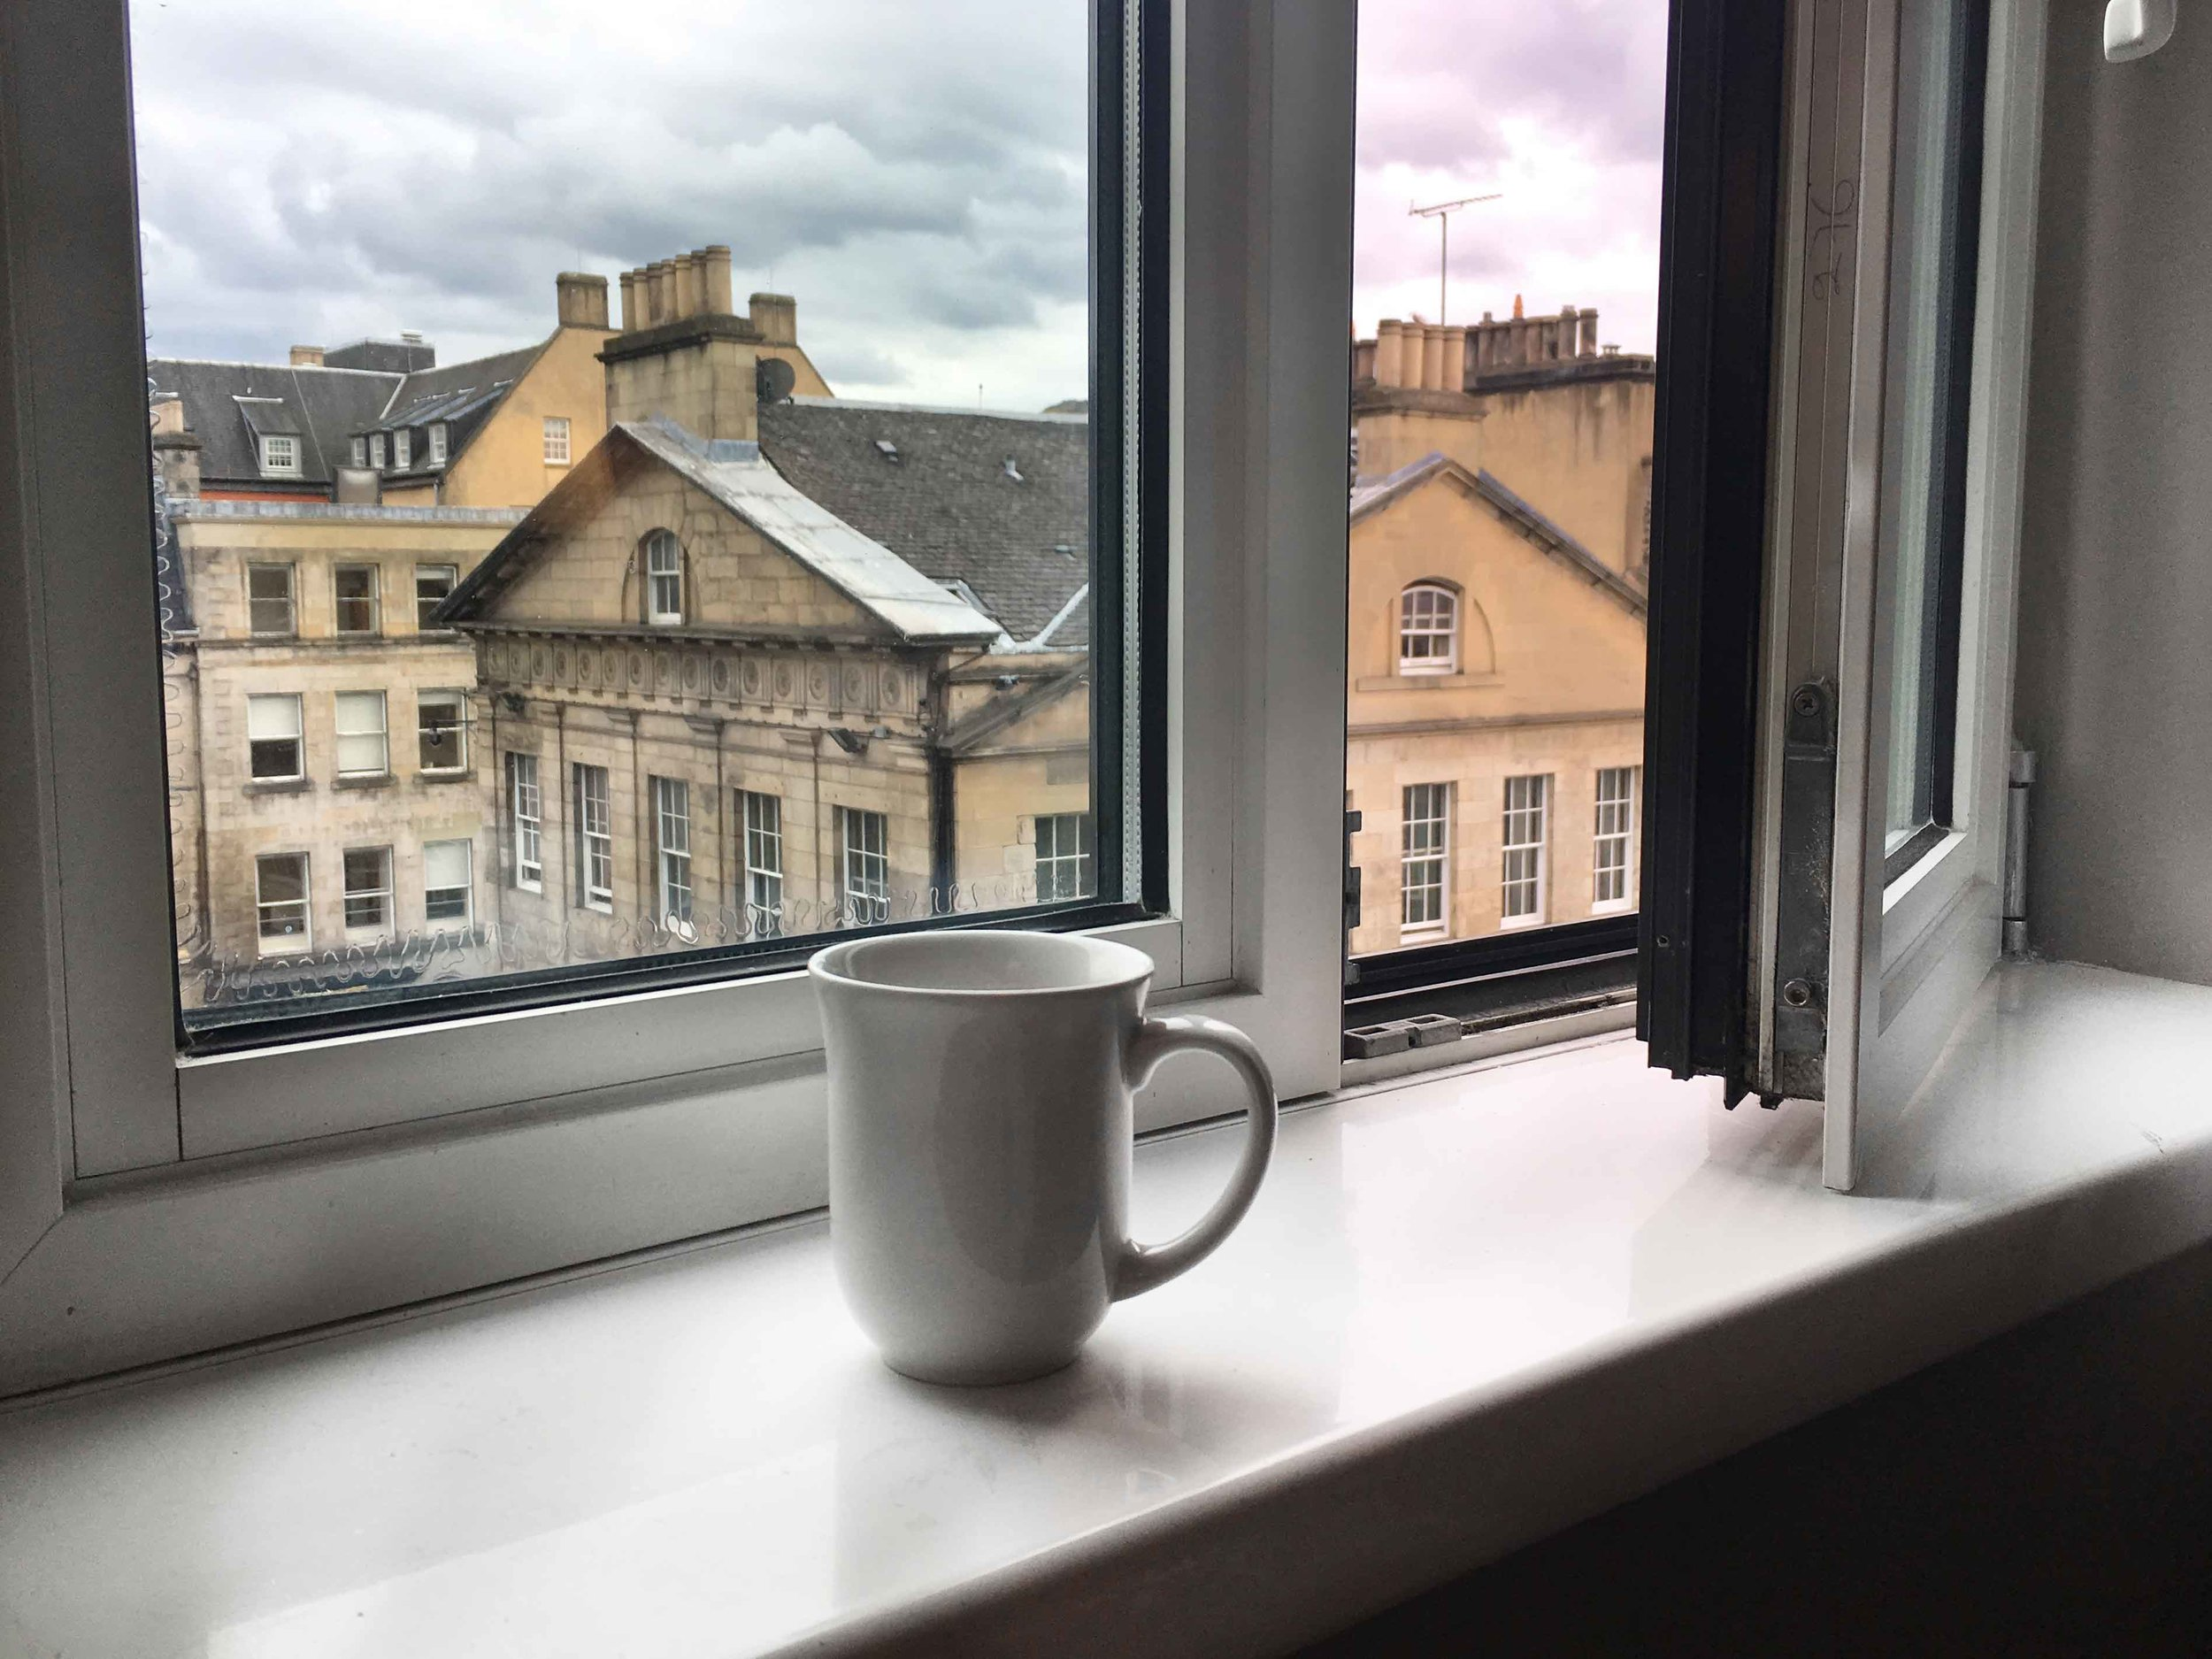 Ibis hotel, Royal Mile, Old Town, Edinburgh, Scotland. Image©thingstodot.com